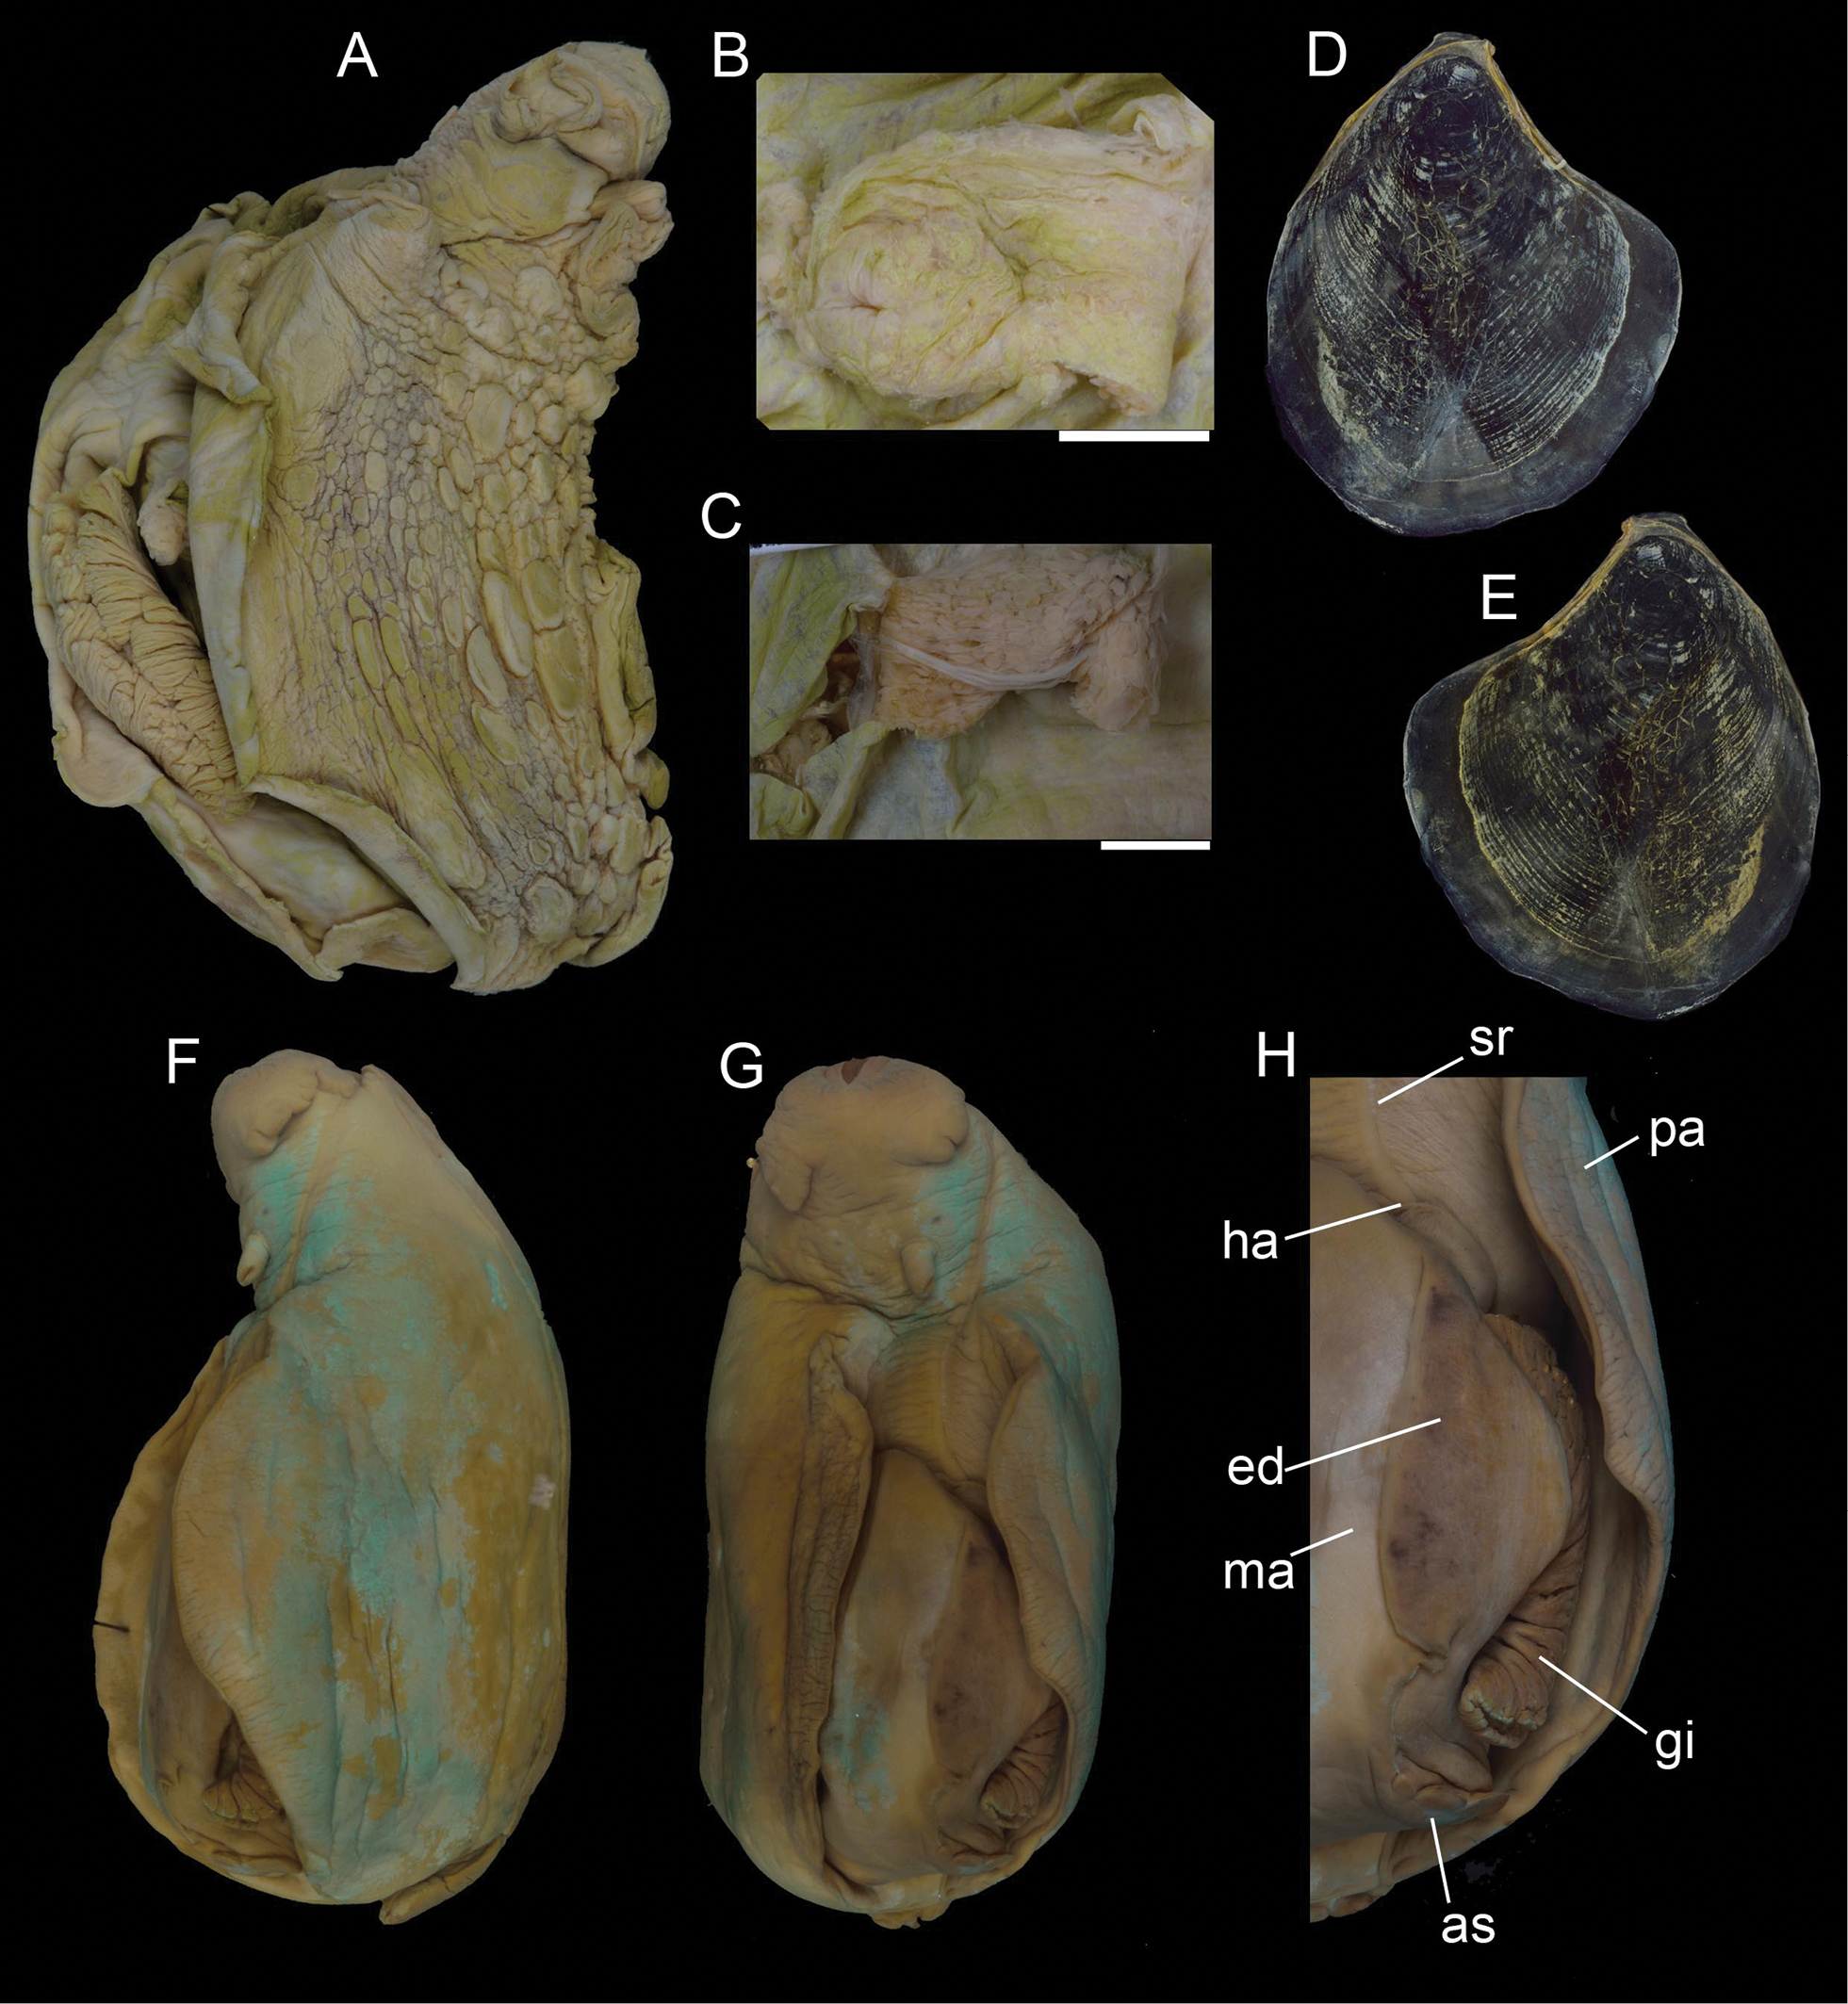 Type specimens of Aplysiida (Gastropoda, Heterobranchia) in